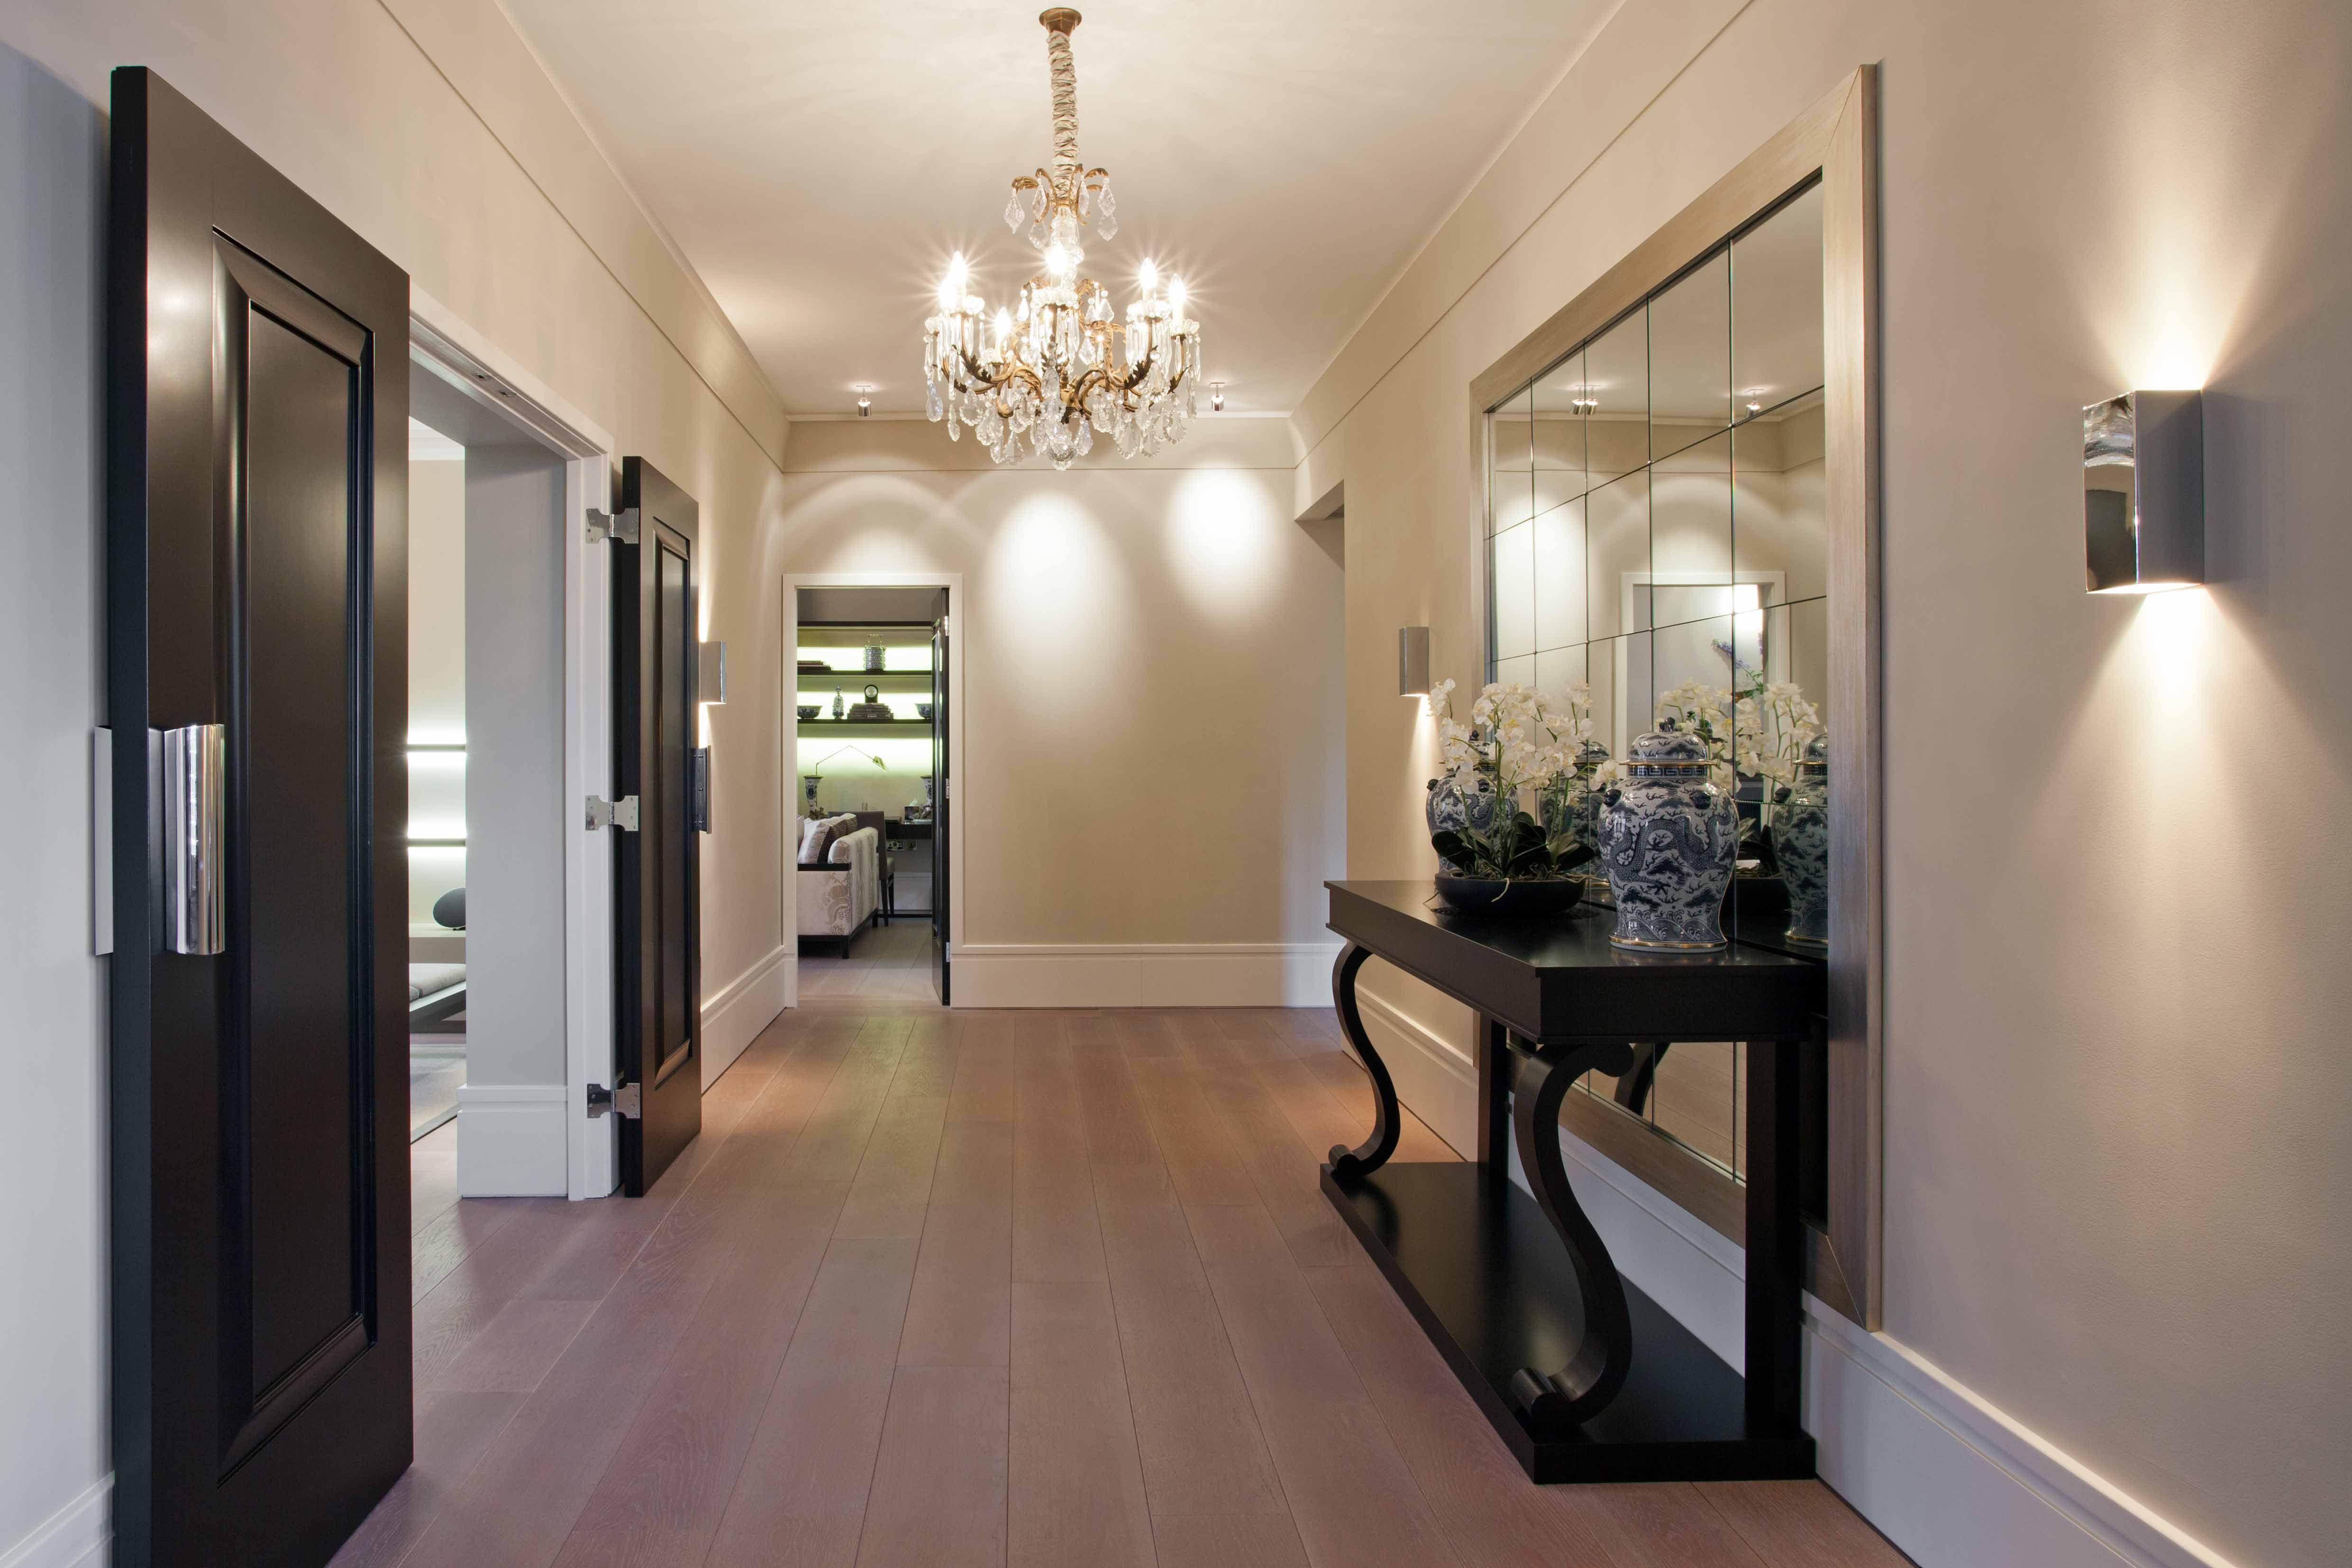 The Studio Harrods Holland Park Luxury Apartment